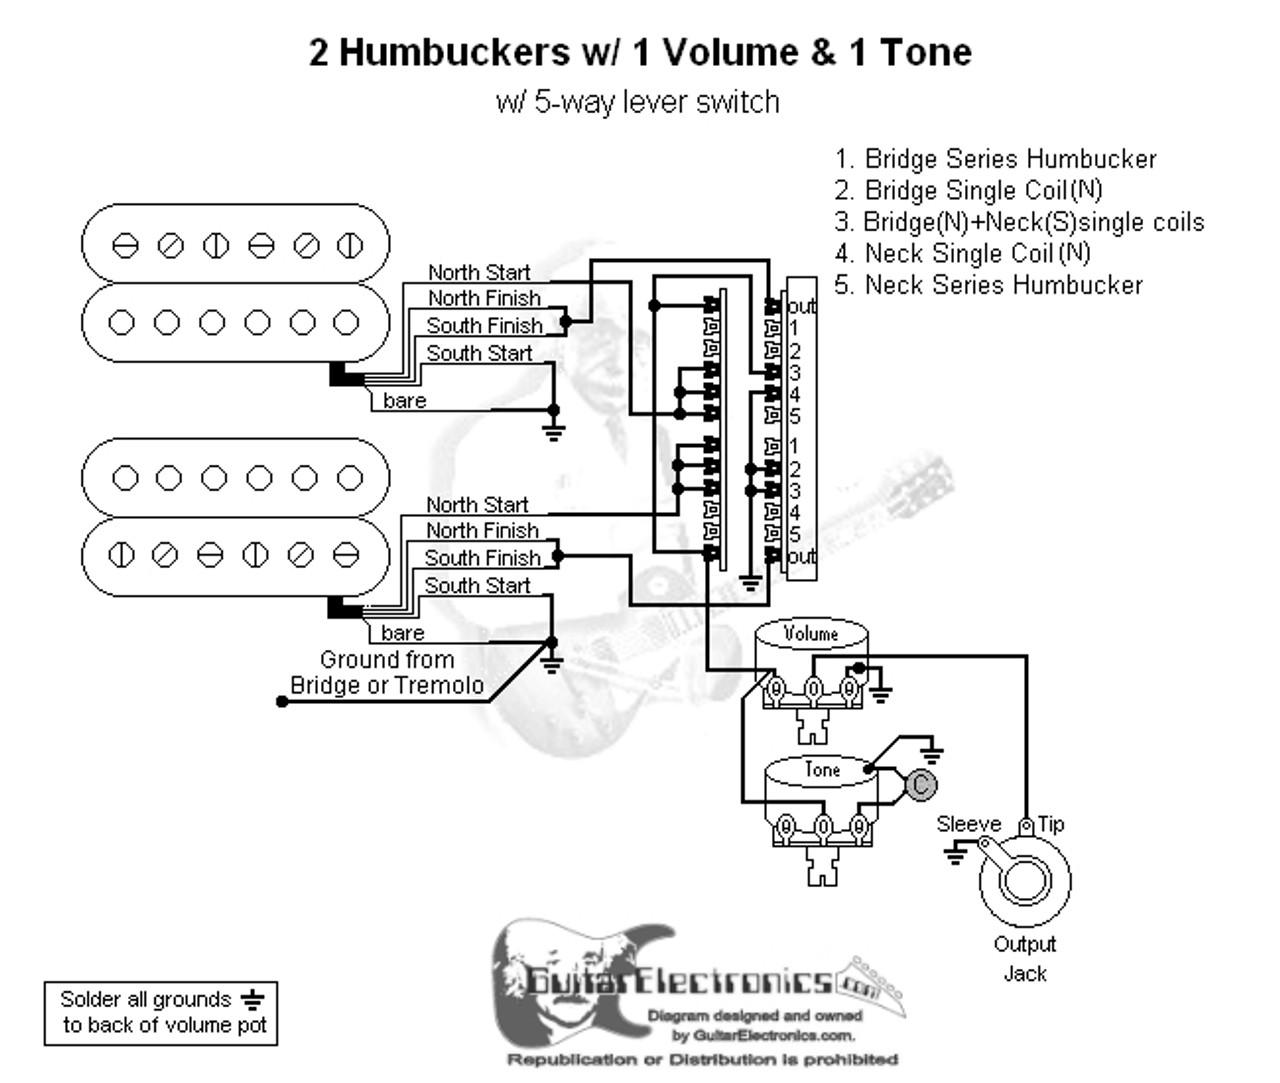 medium resolution of 2 humbuckers 1 vol 1 tone 5 way super switch wiring diagram schema2 humbuckers 5 way lever switch 1 volume 1 tone 01 2 humbuckers 1 vol 1 tone 5 way super